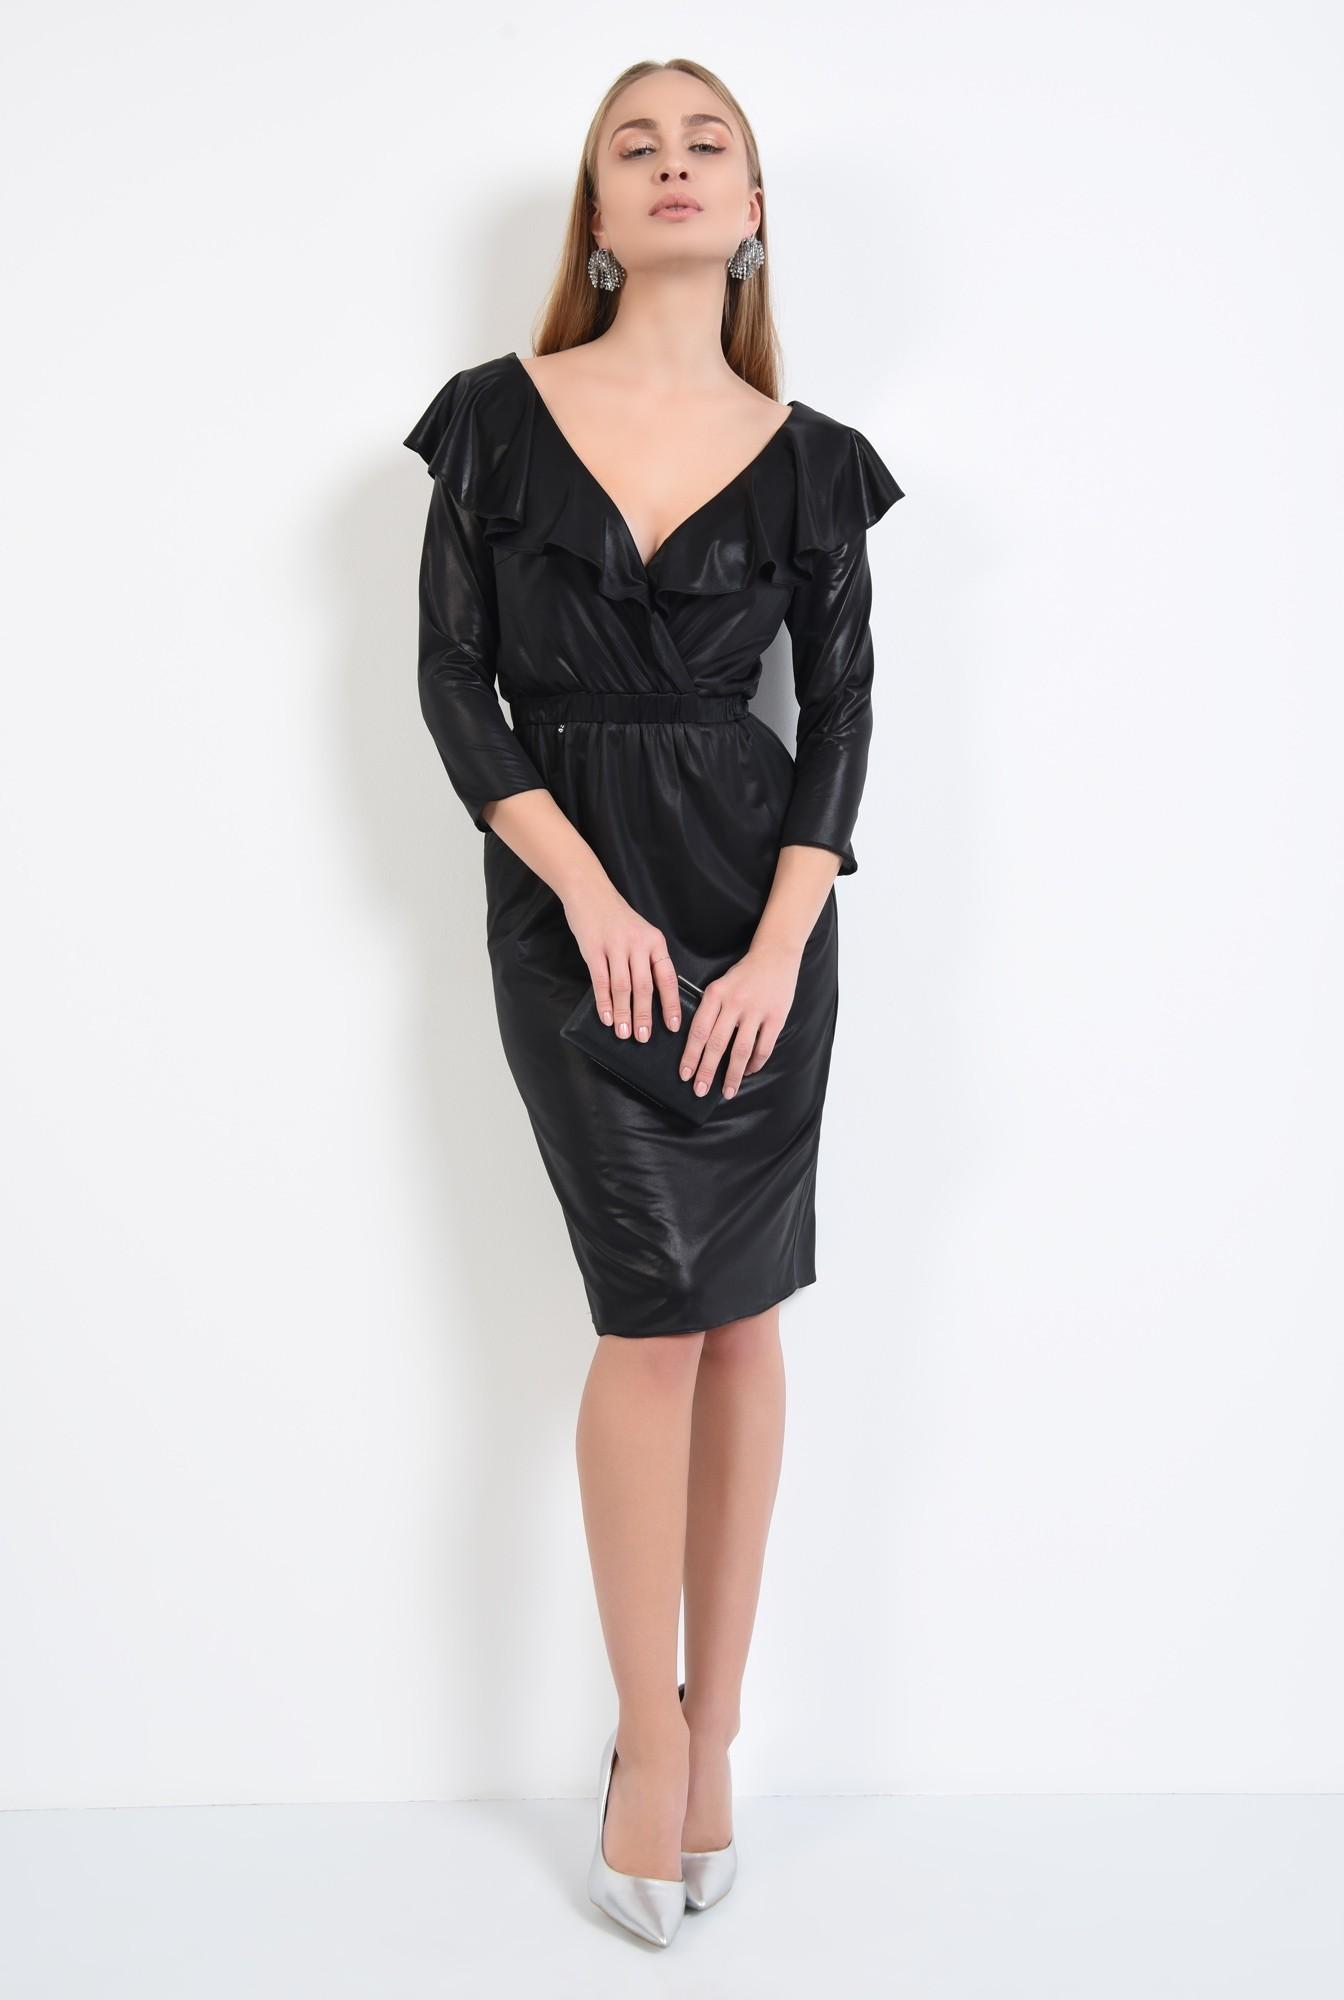 3 - rochie neagra, de ocazie, midi, cambrata cu elastic, cu volane